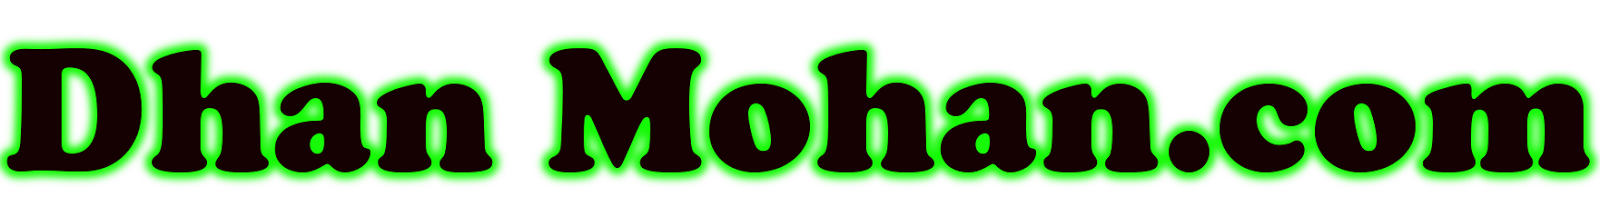 Dhan Mohan.com